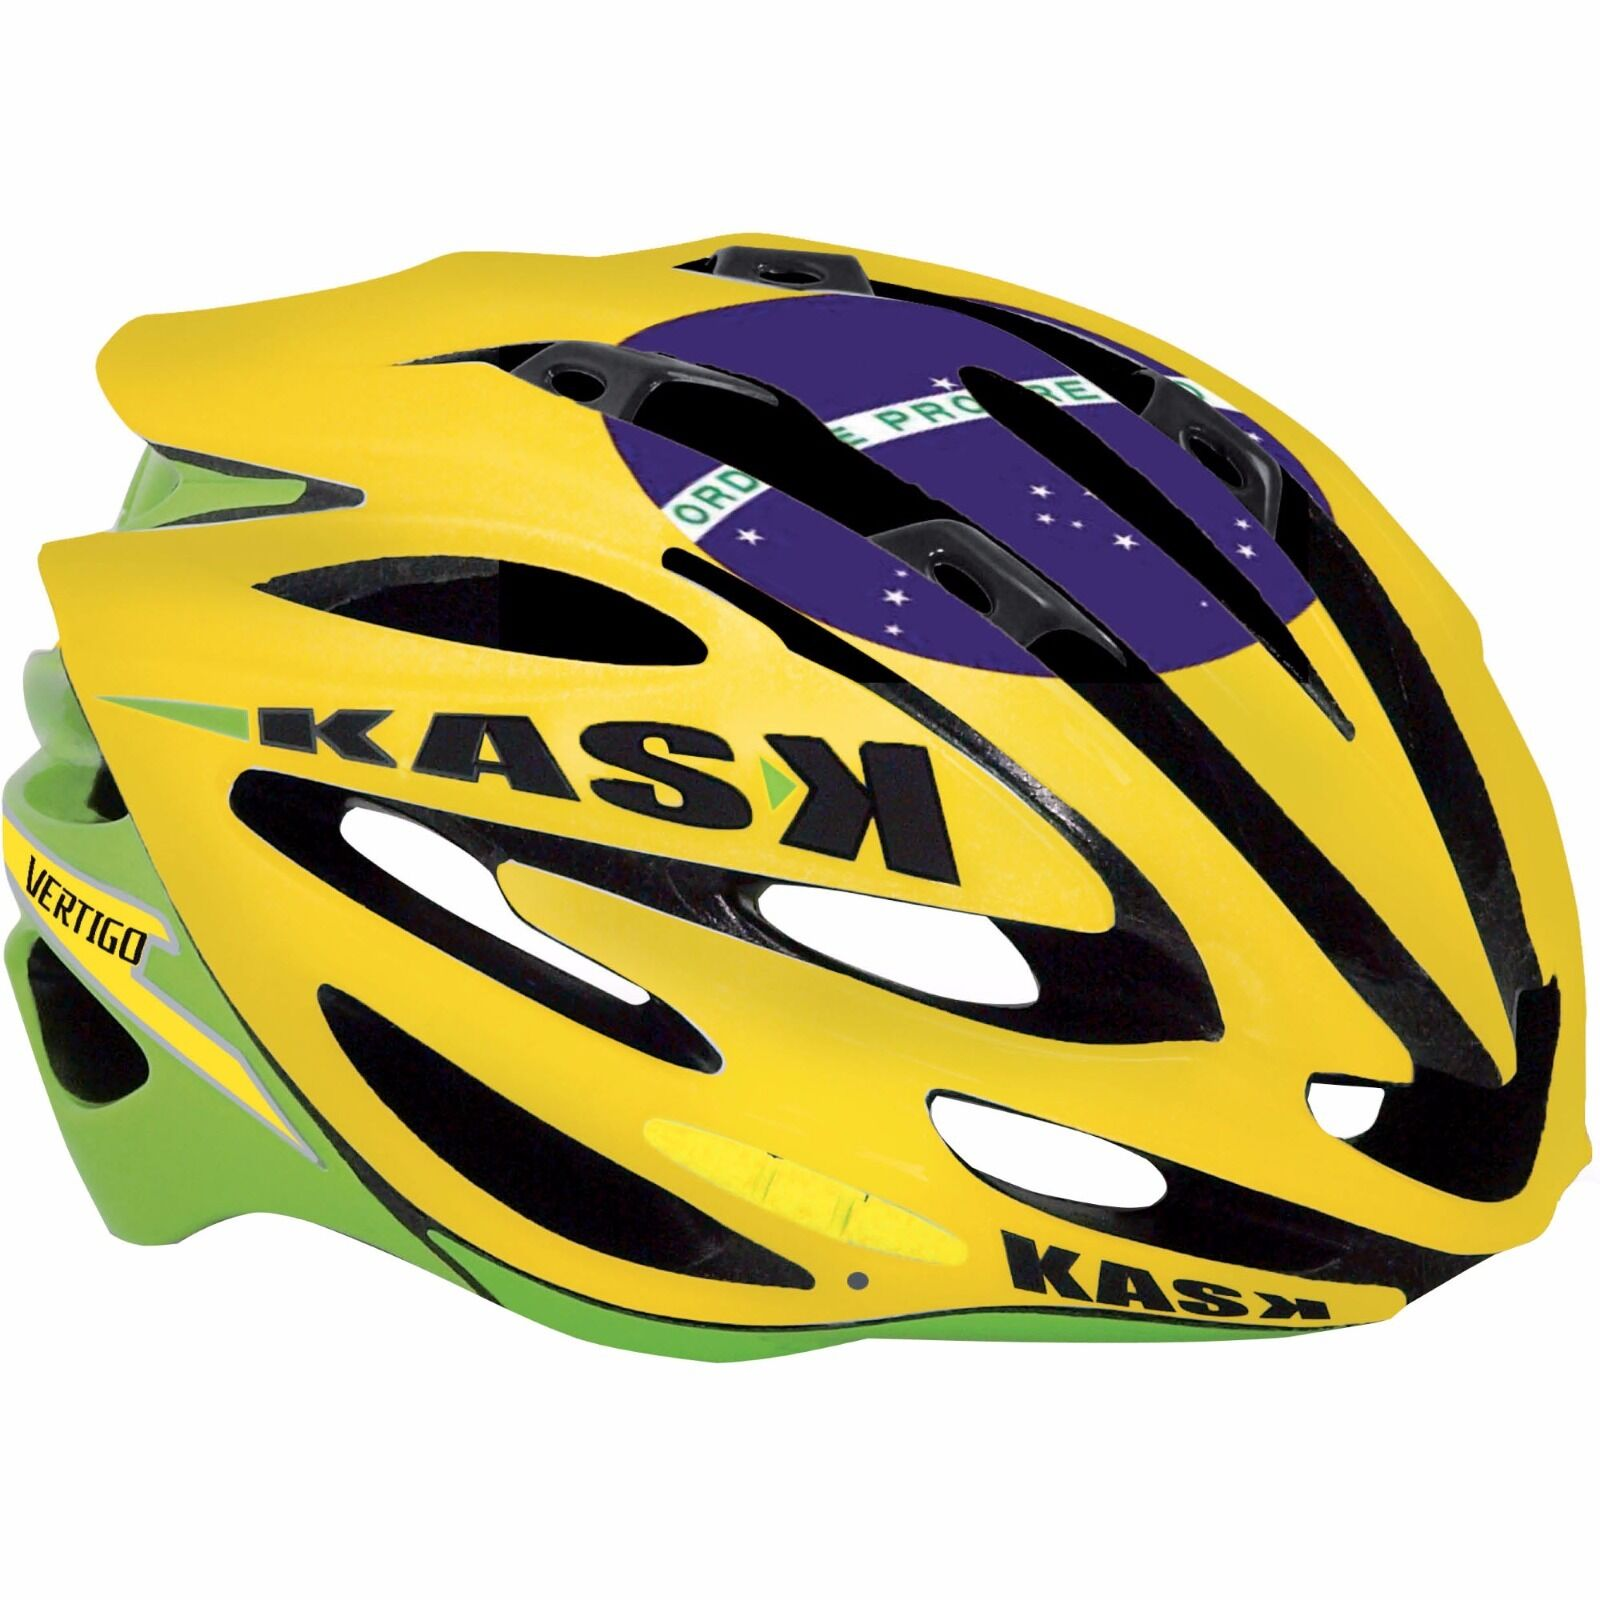 Kask greenigo Cycling Bicycle Bike Helmet Limited Edition Brazil Flag size Medium